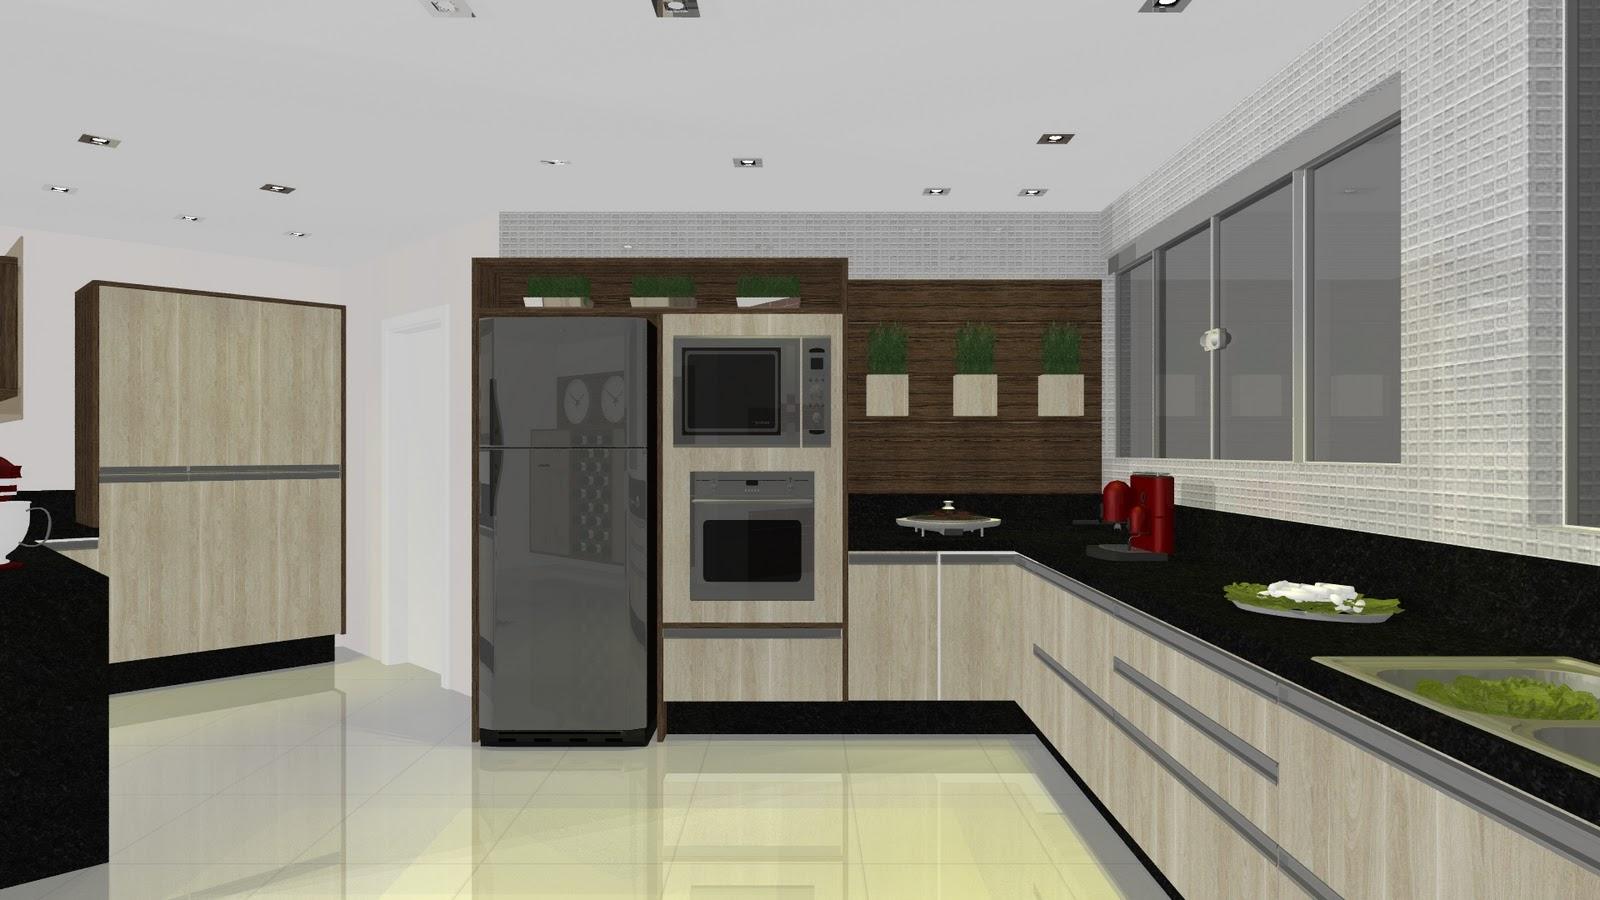 ensaios!!! Charles Chaplin: Projeto BENTEC Cozinha x Sala de Jantar #797752 1600 900